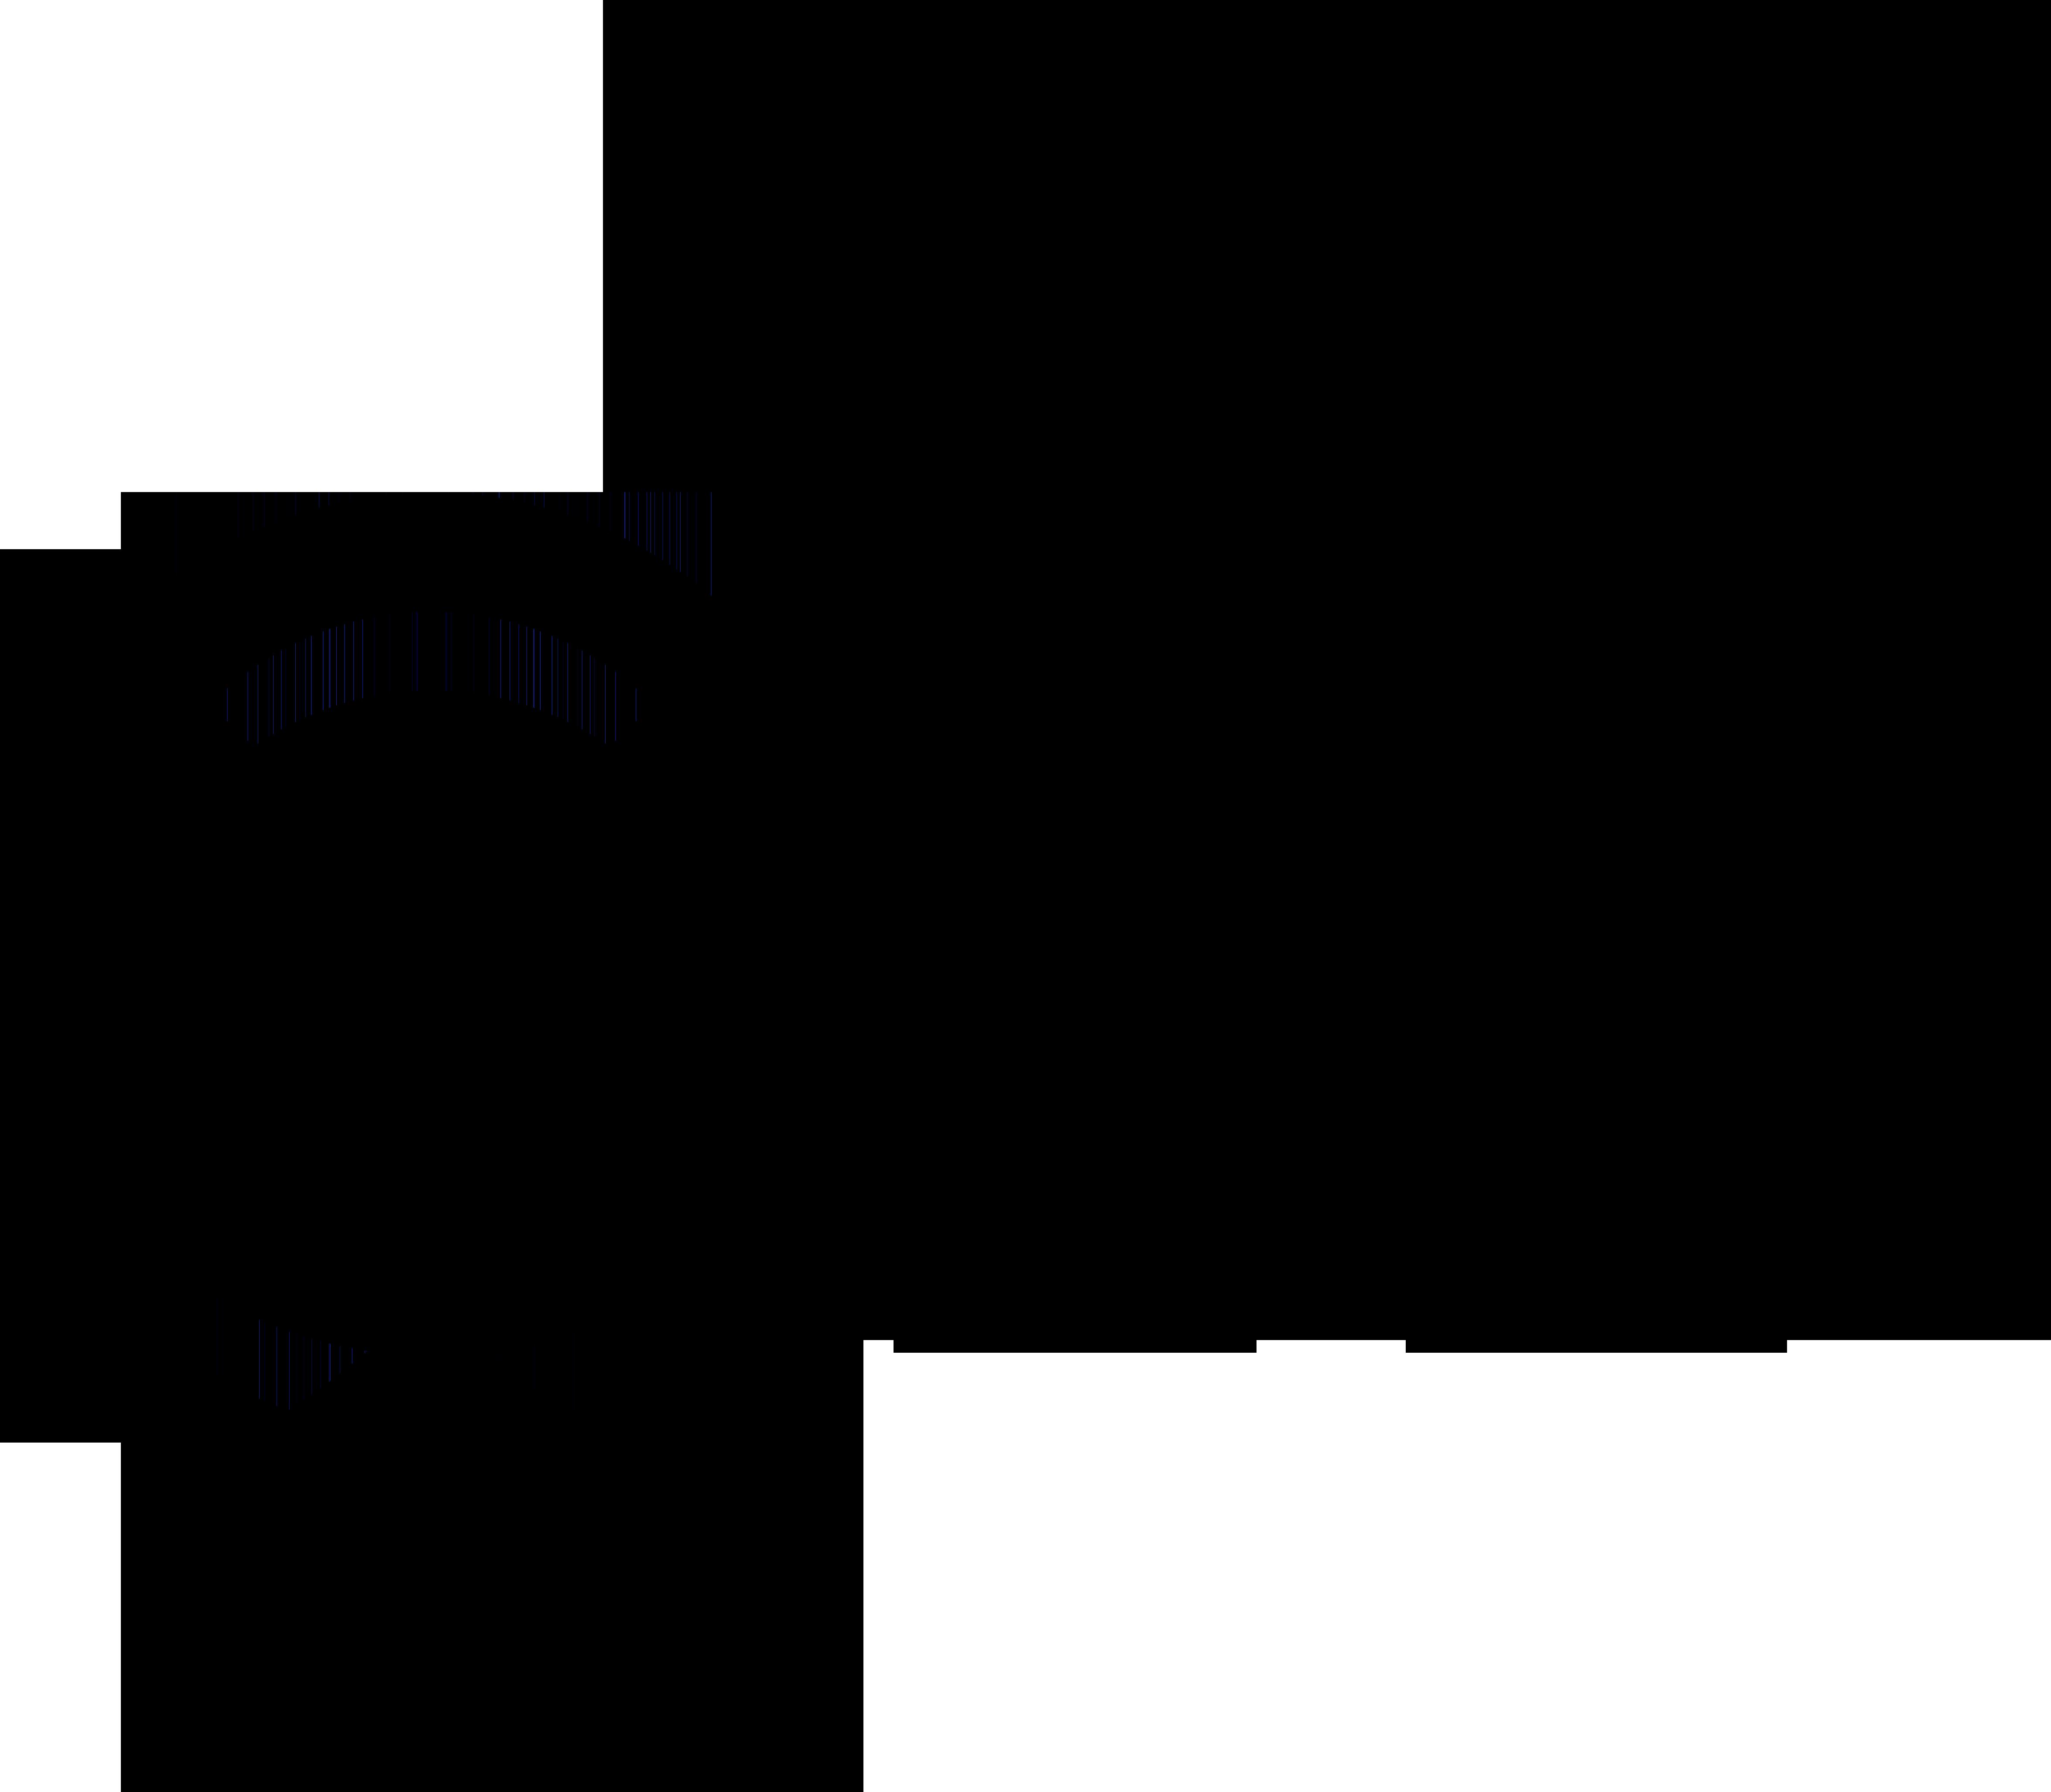 Nonbinary symbol interlocked with a Venus symbol and a nonbinary symbol.